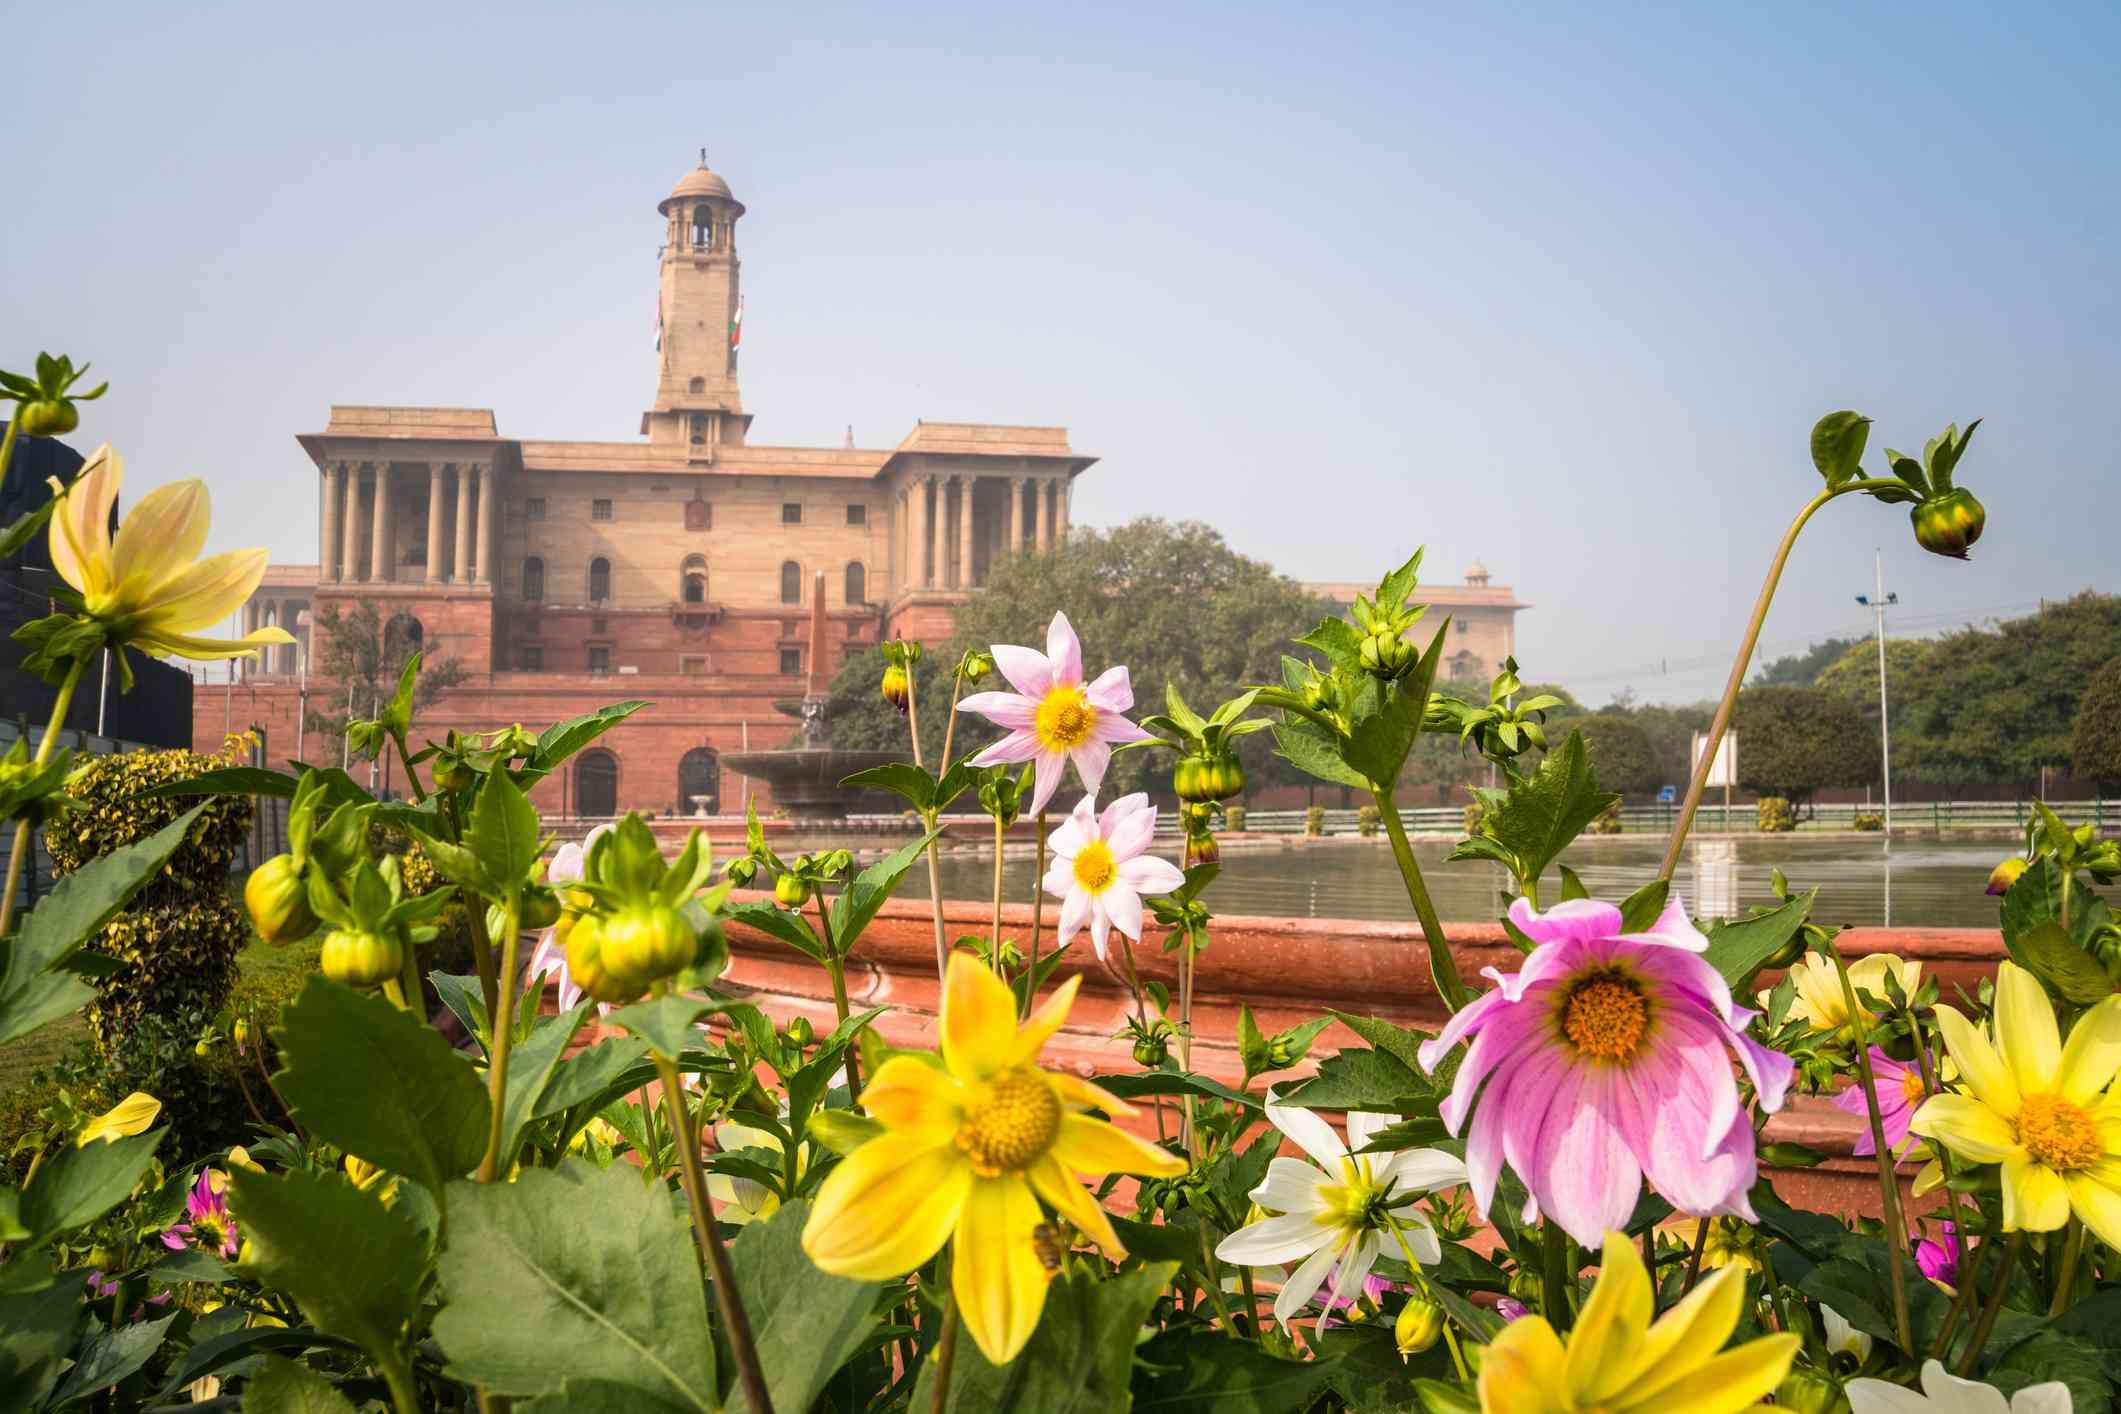 Flowers in a formal garden, Mughal garden, Rashtrapati Bhavan